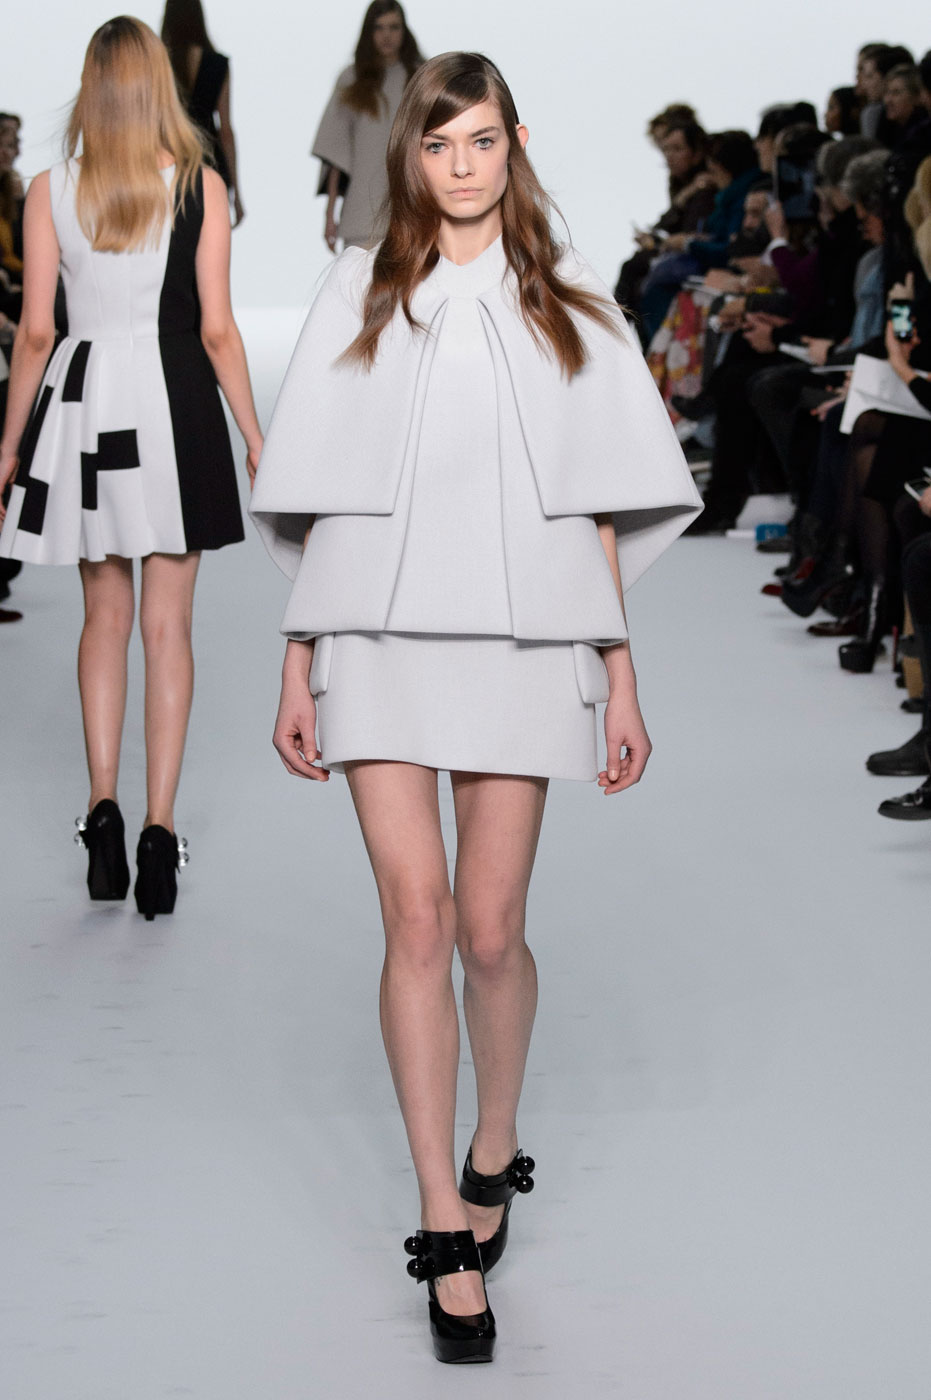 Kayek-fashion-runway-show-haute-couture-paris-spring-summer-2015-the-impression-17